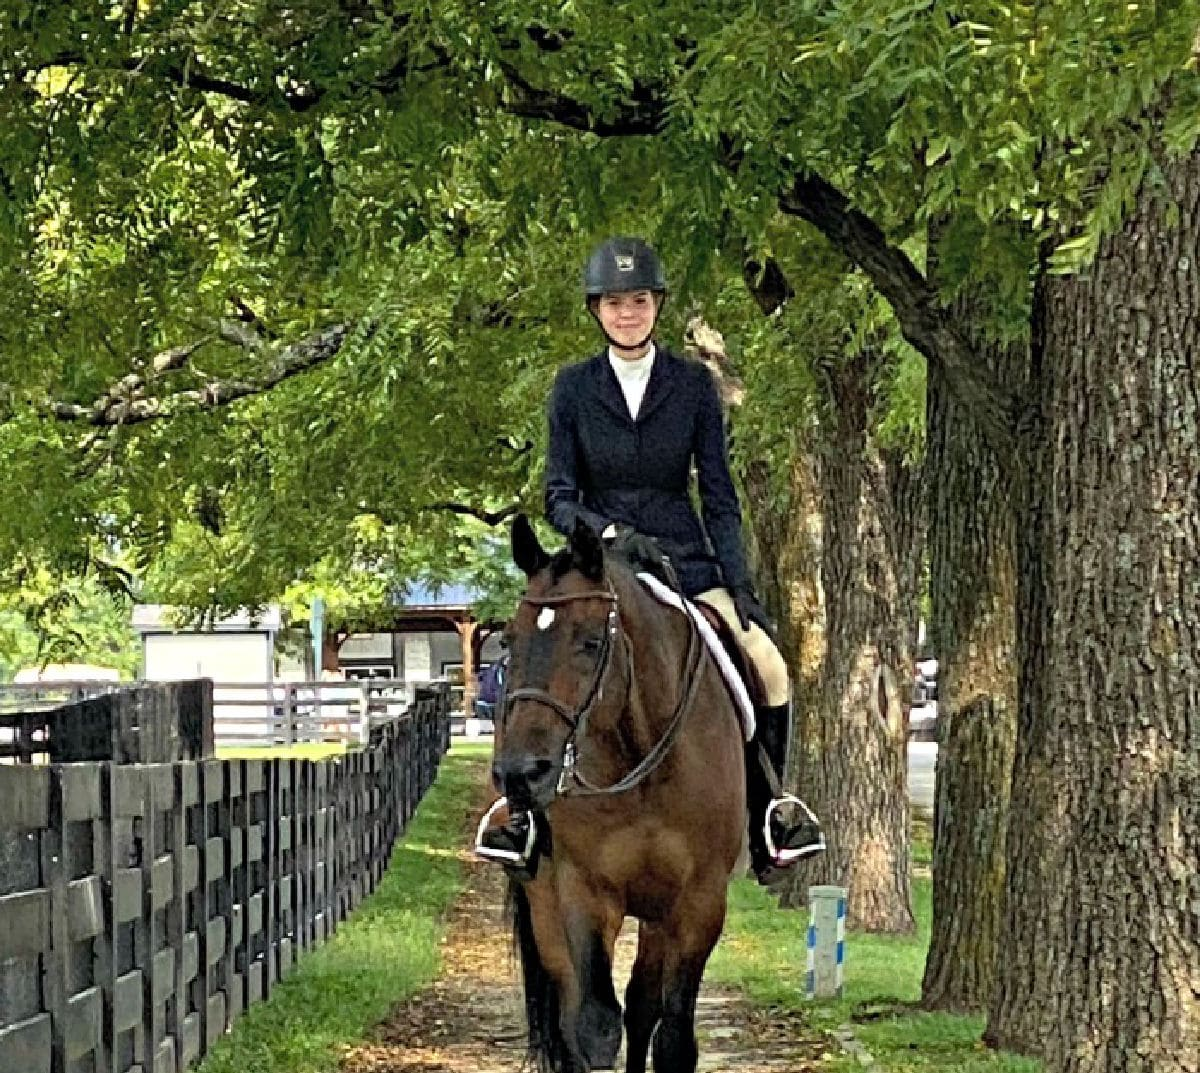 horse-jockey-walking-through-overgrown-trees